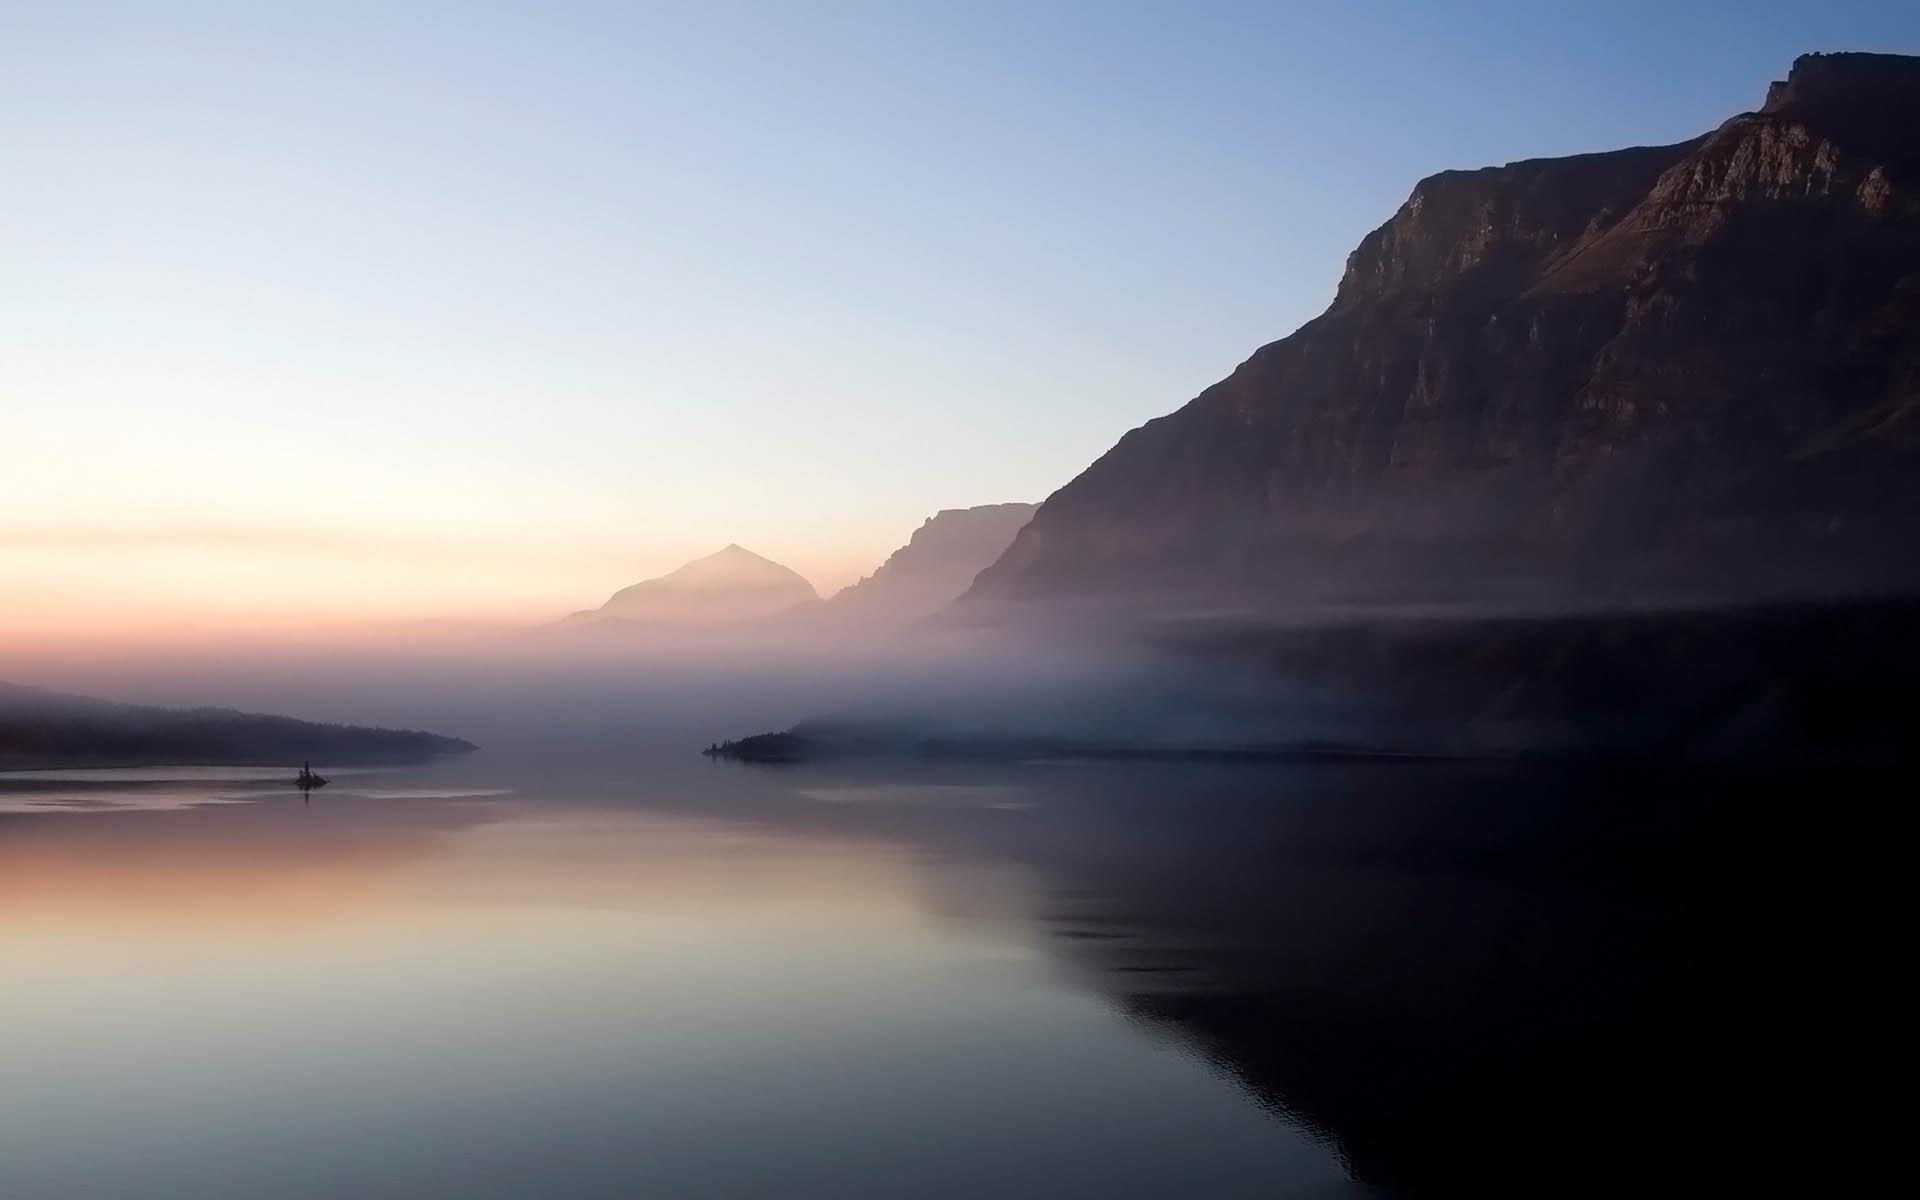 Amazing Lake Mist Wallpaper